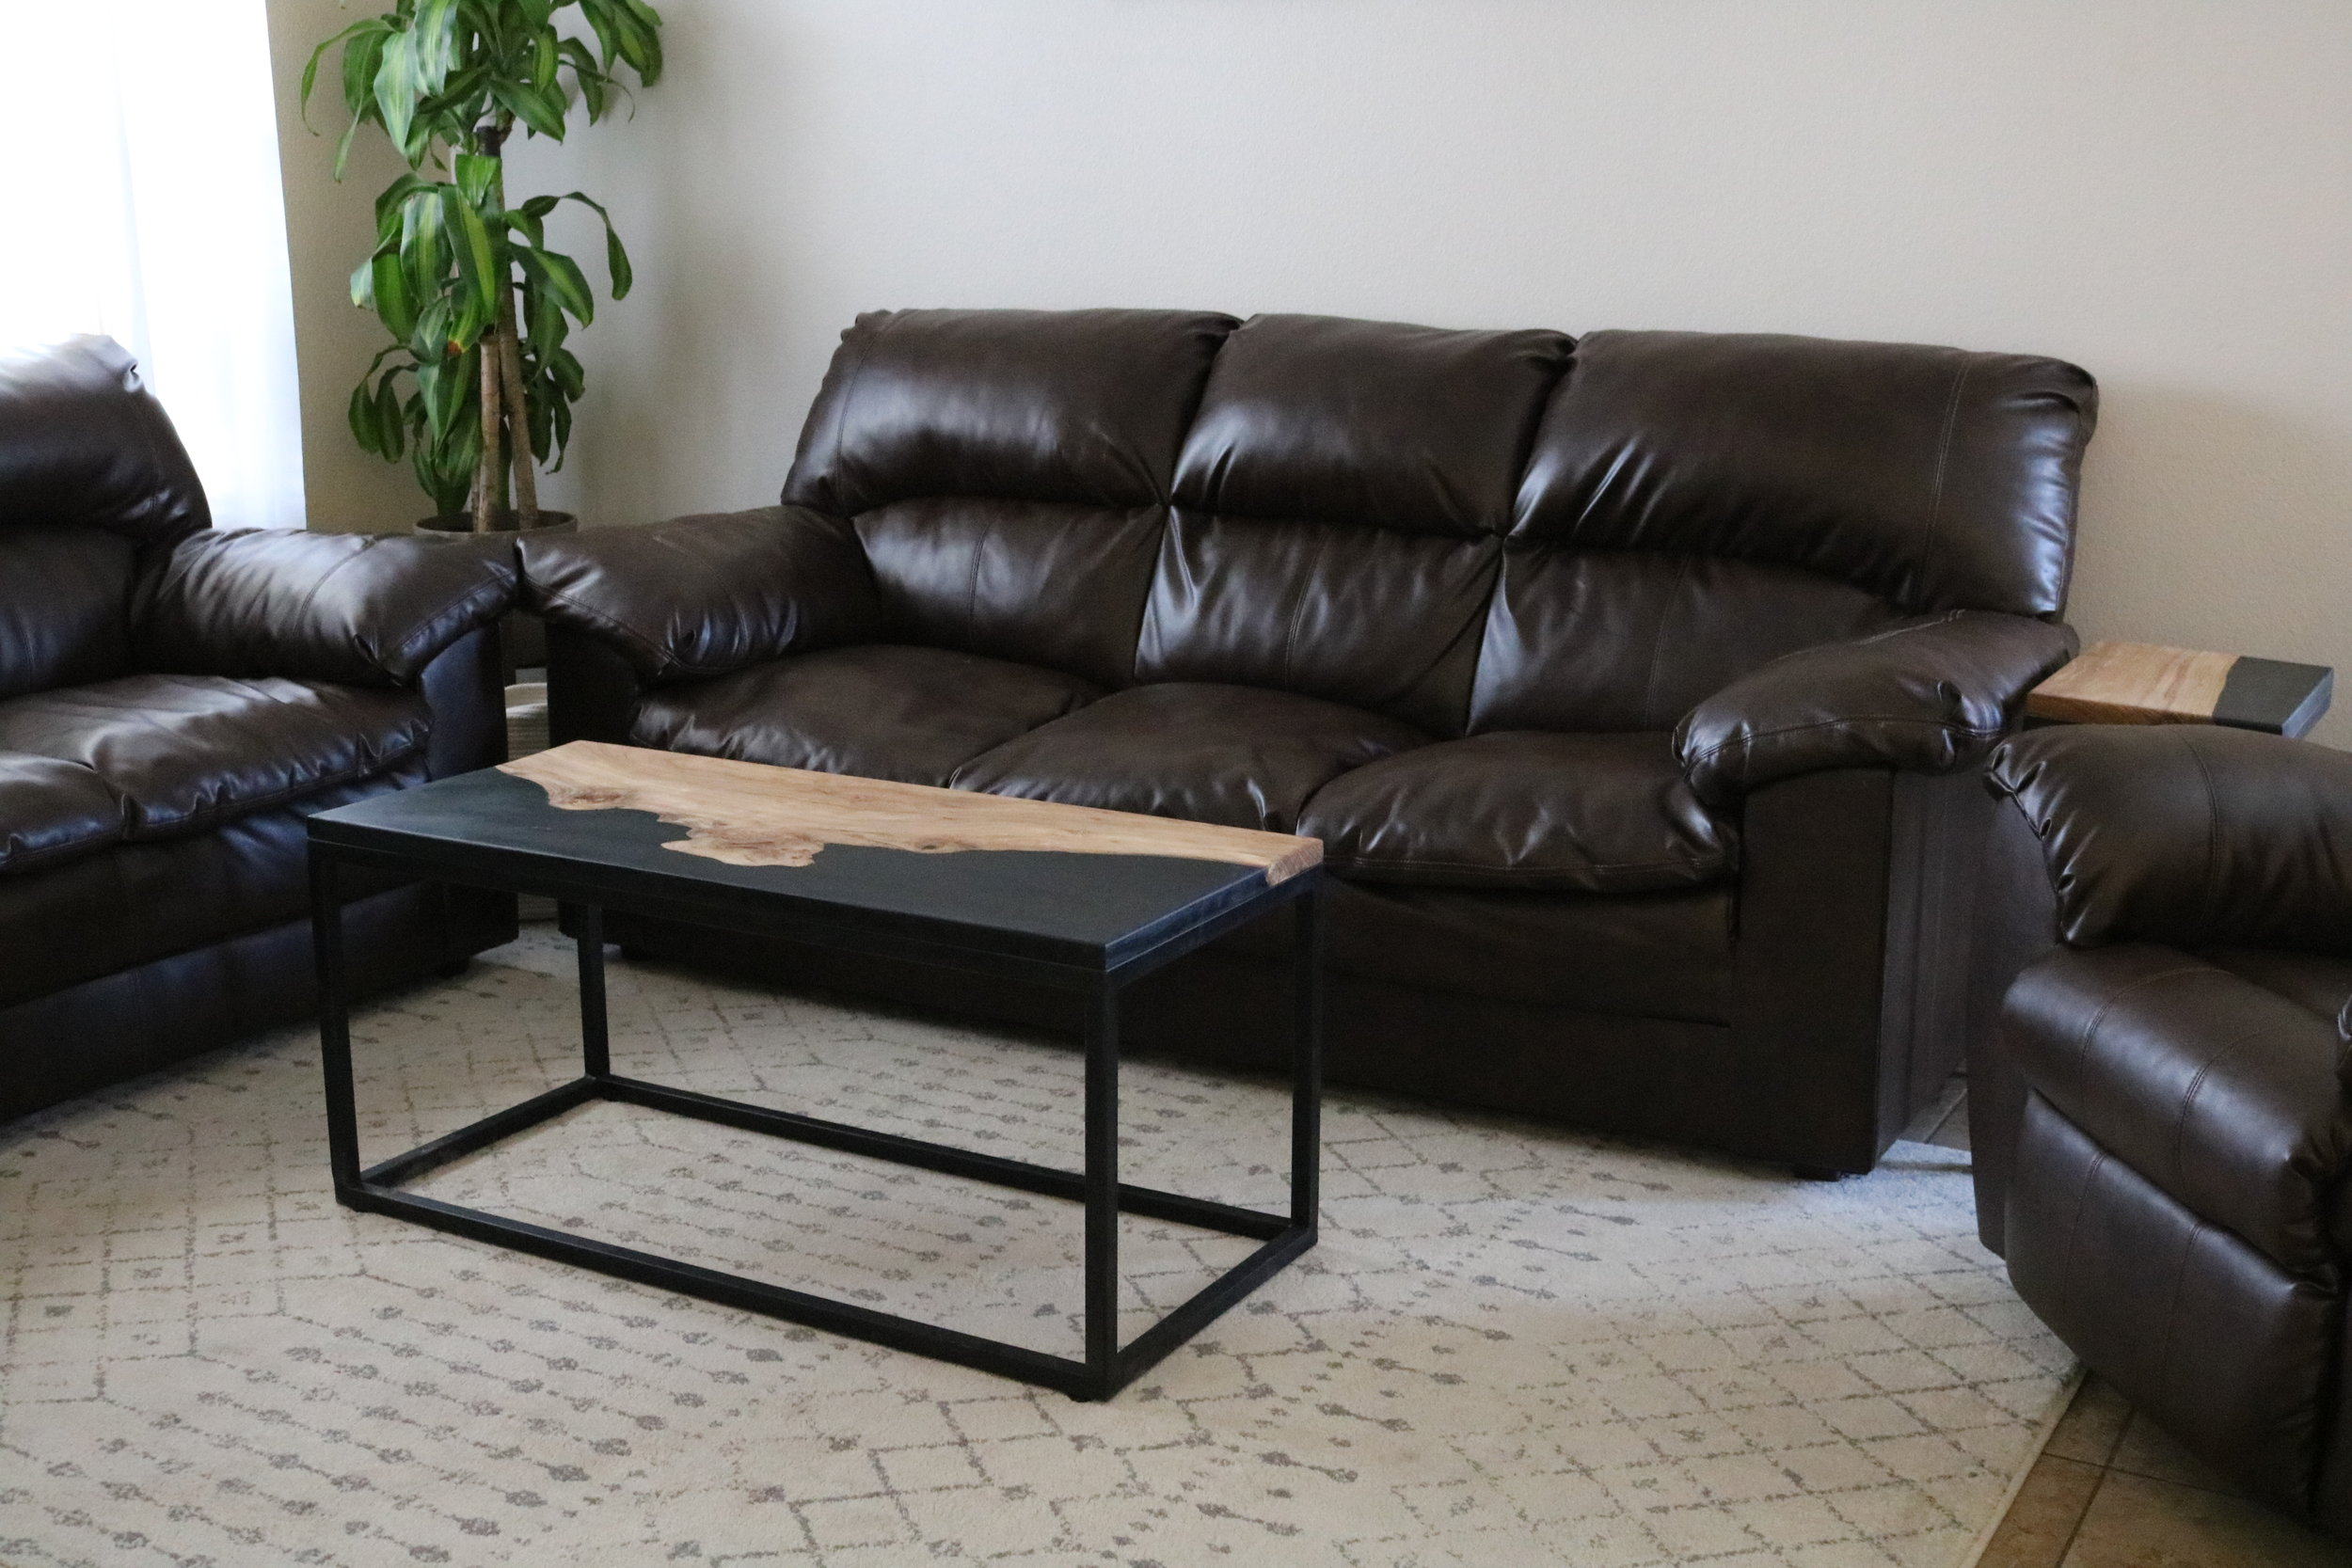 epoxy-resin-river-coffee-table-custom-coffee-table.JPG